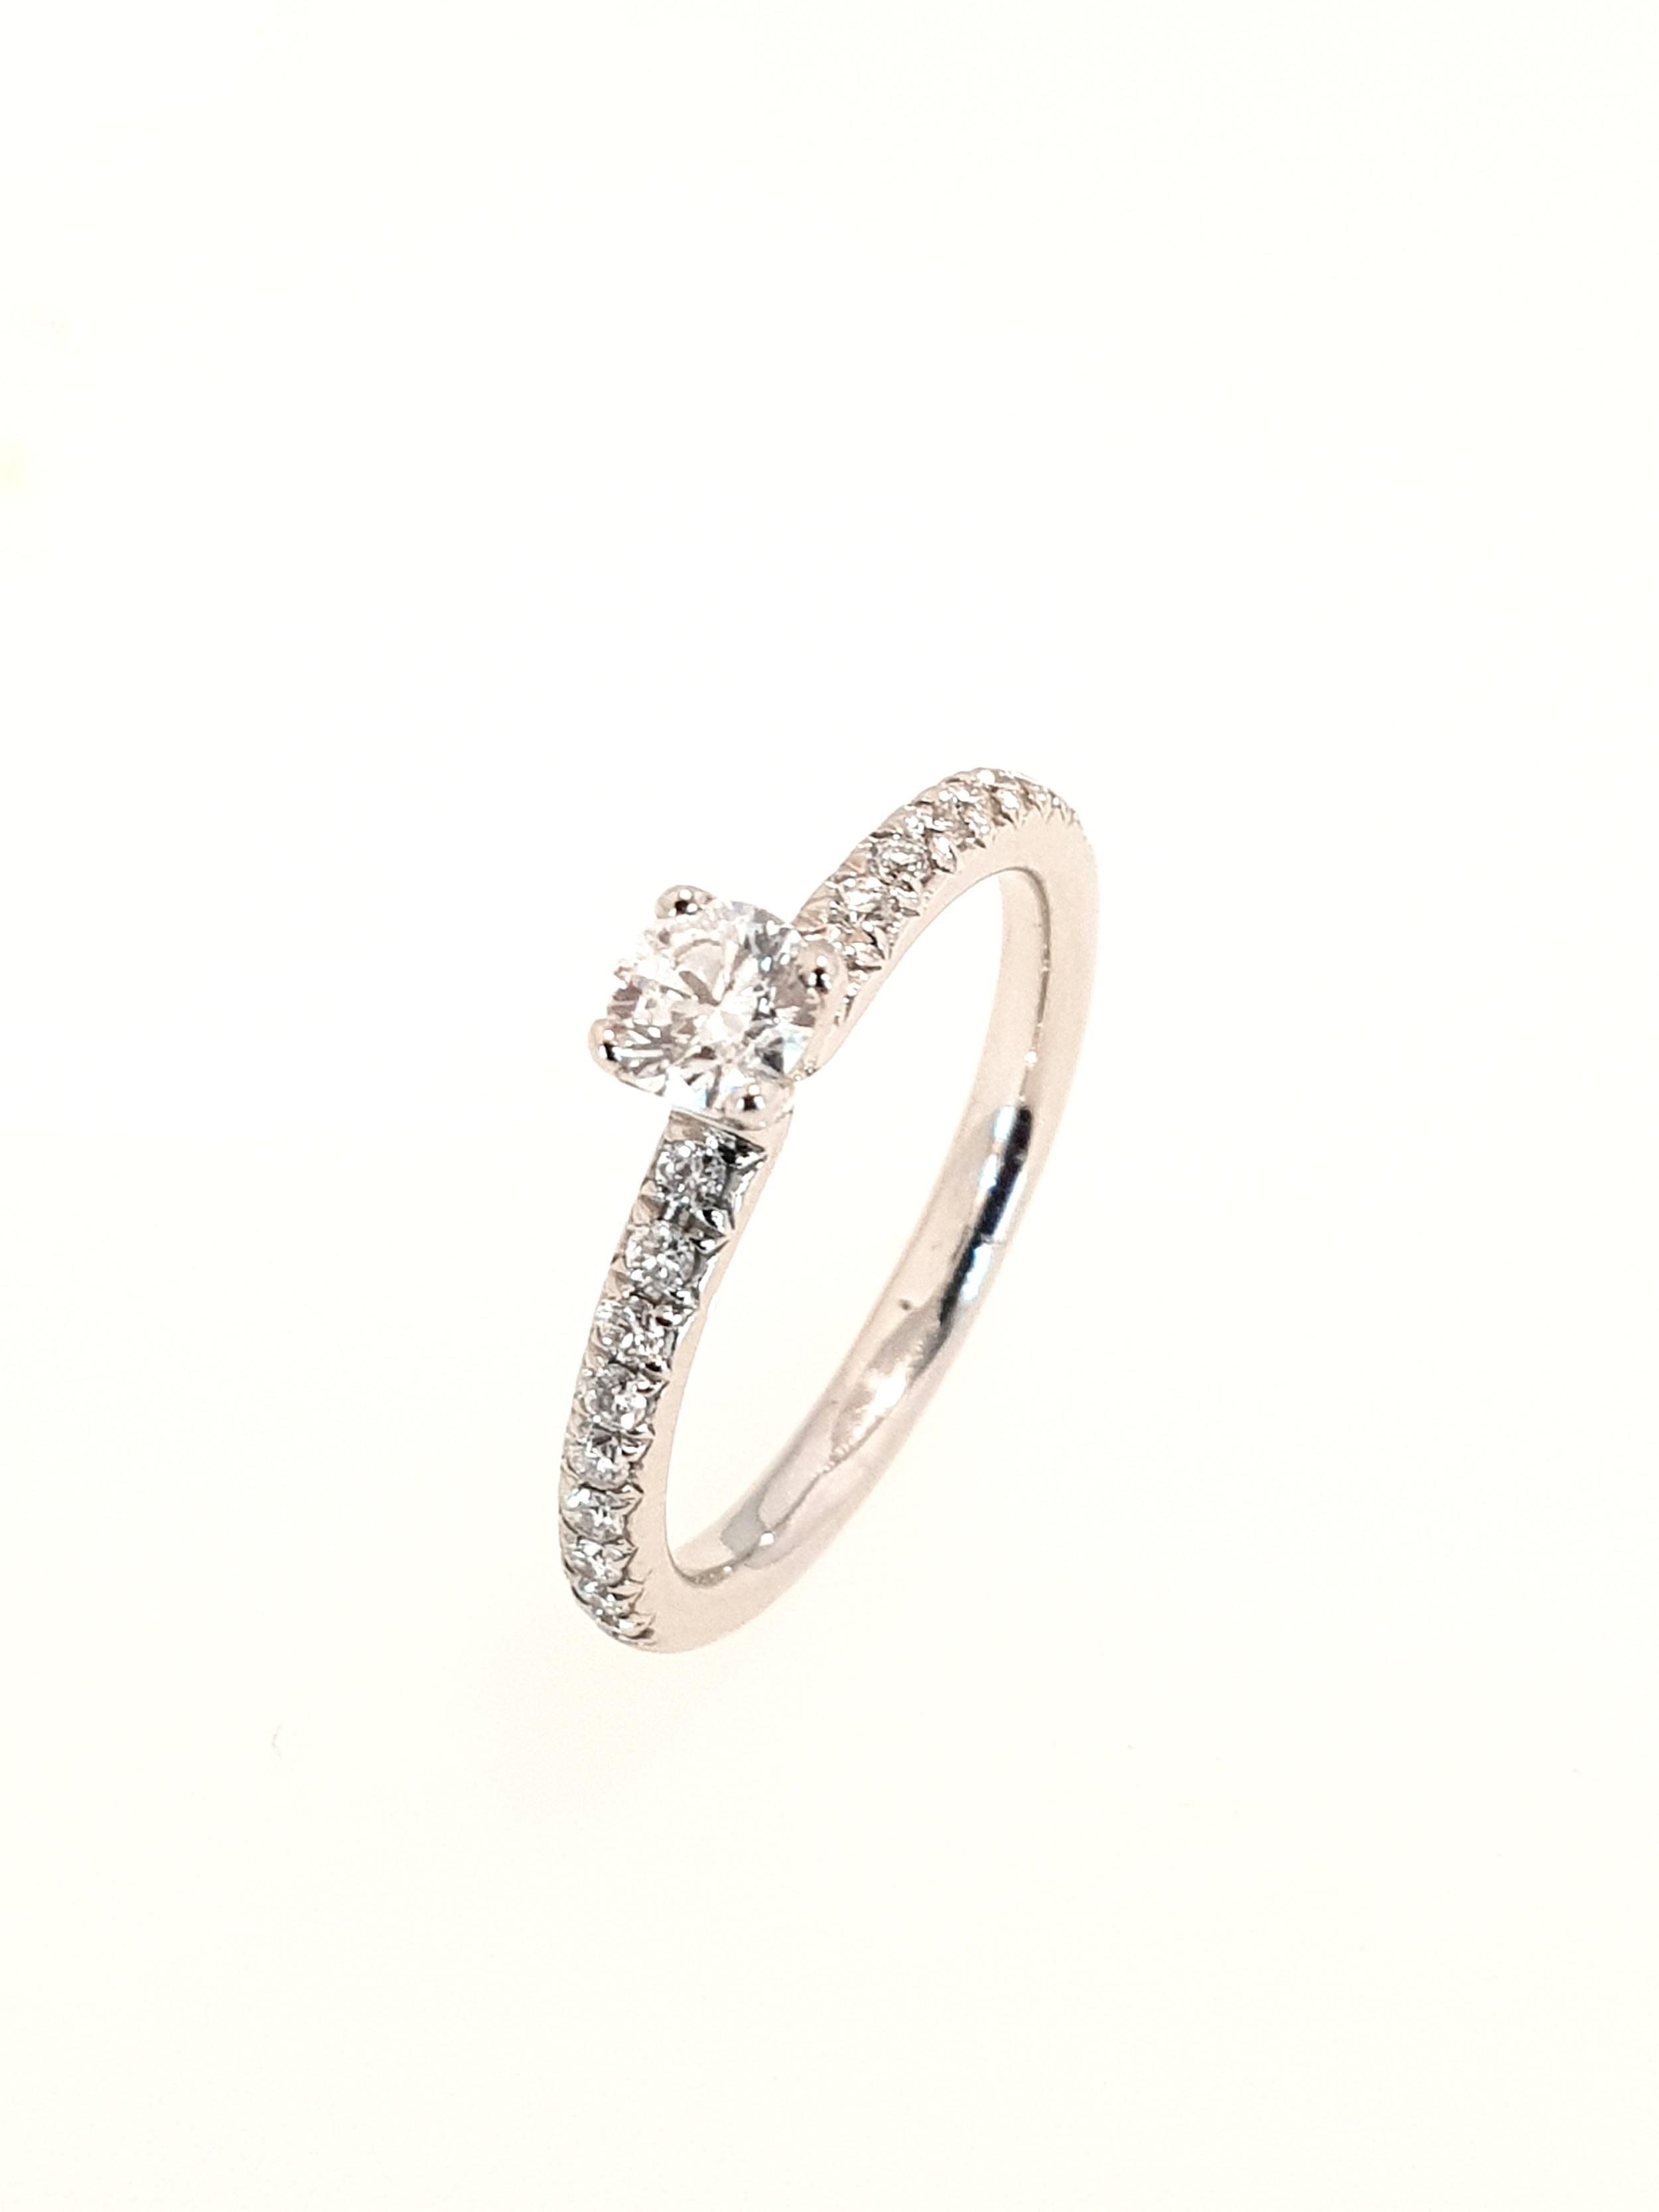 Platinum Diamond Ring  .41ct, G, Si1  Stock Code: N8743  £1560